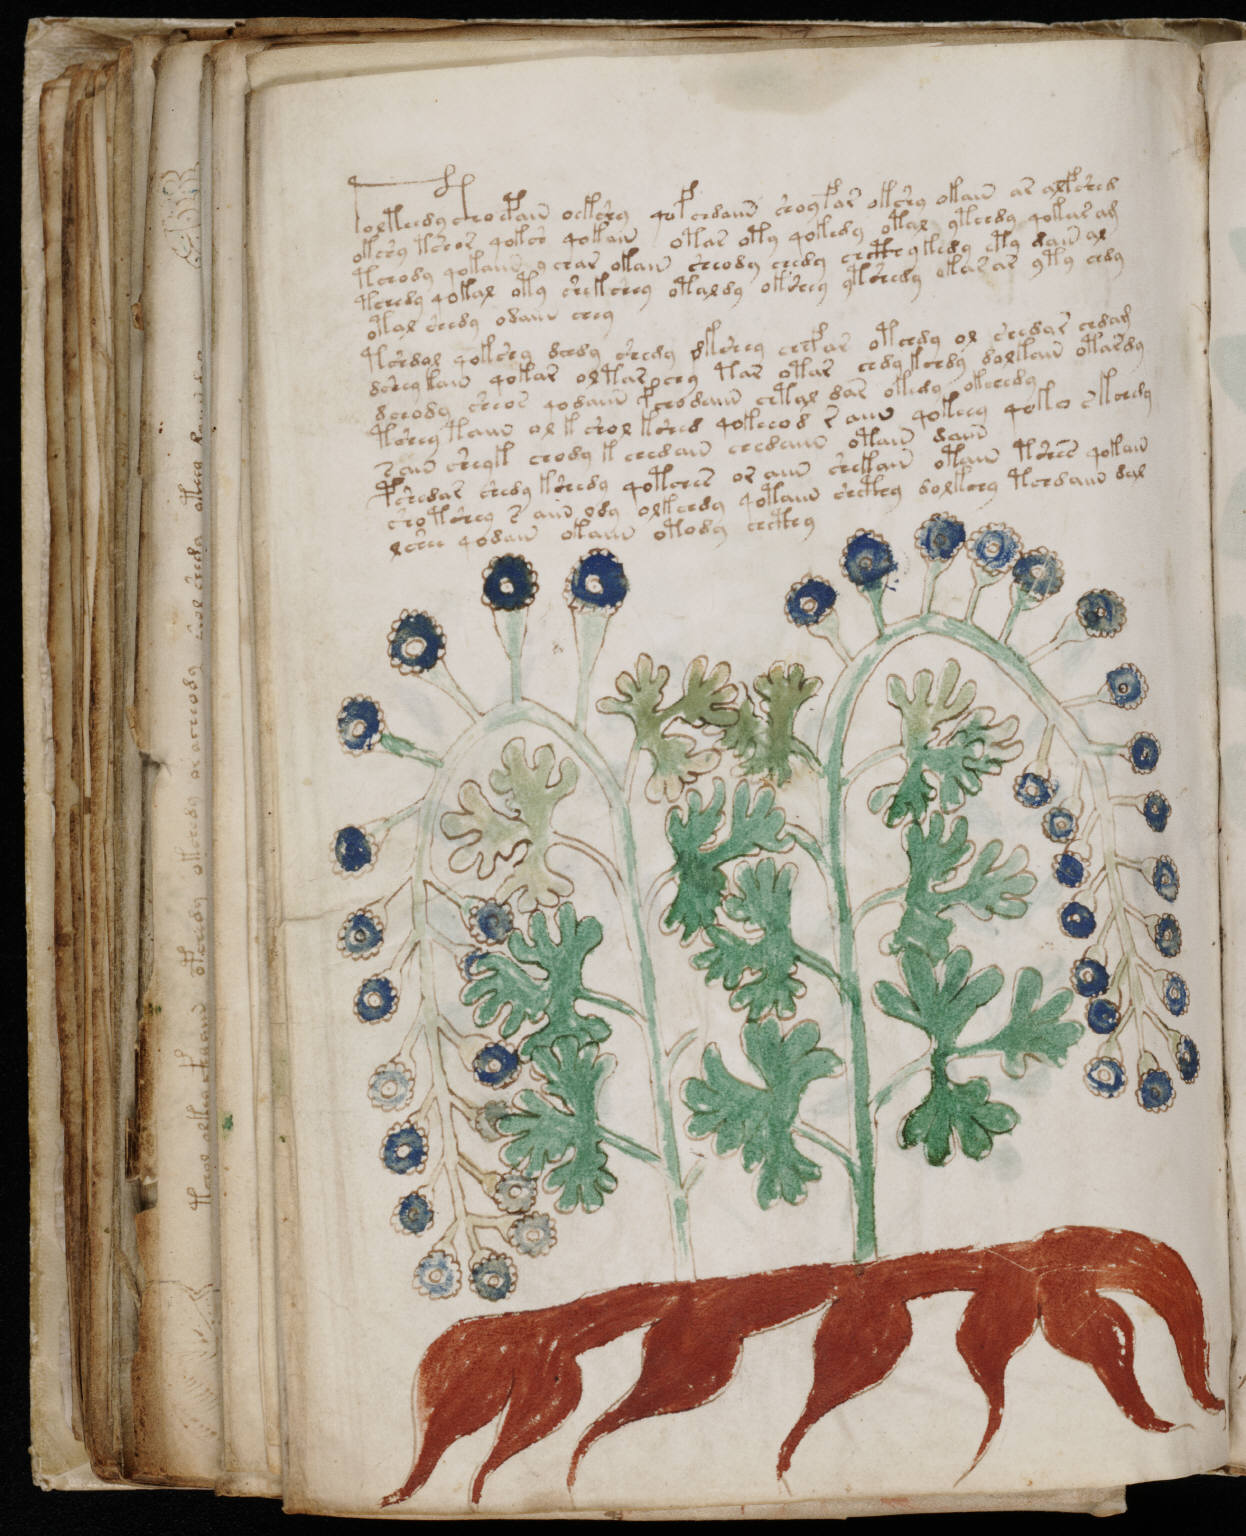 voynich manuscript full pdf download